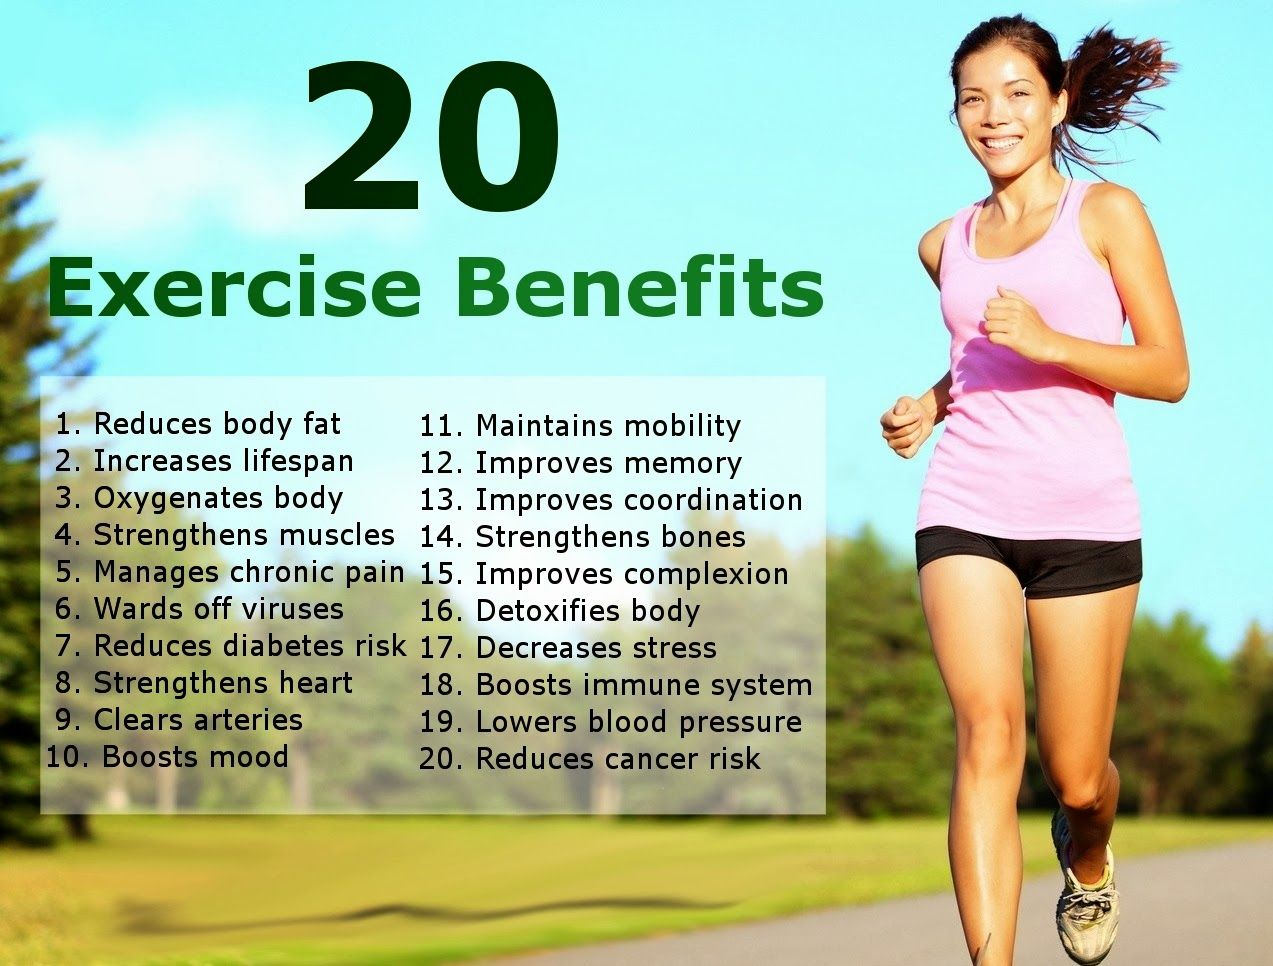 20 Exercise Benefits